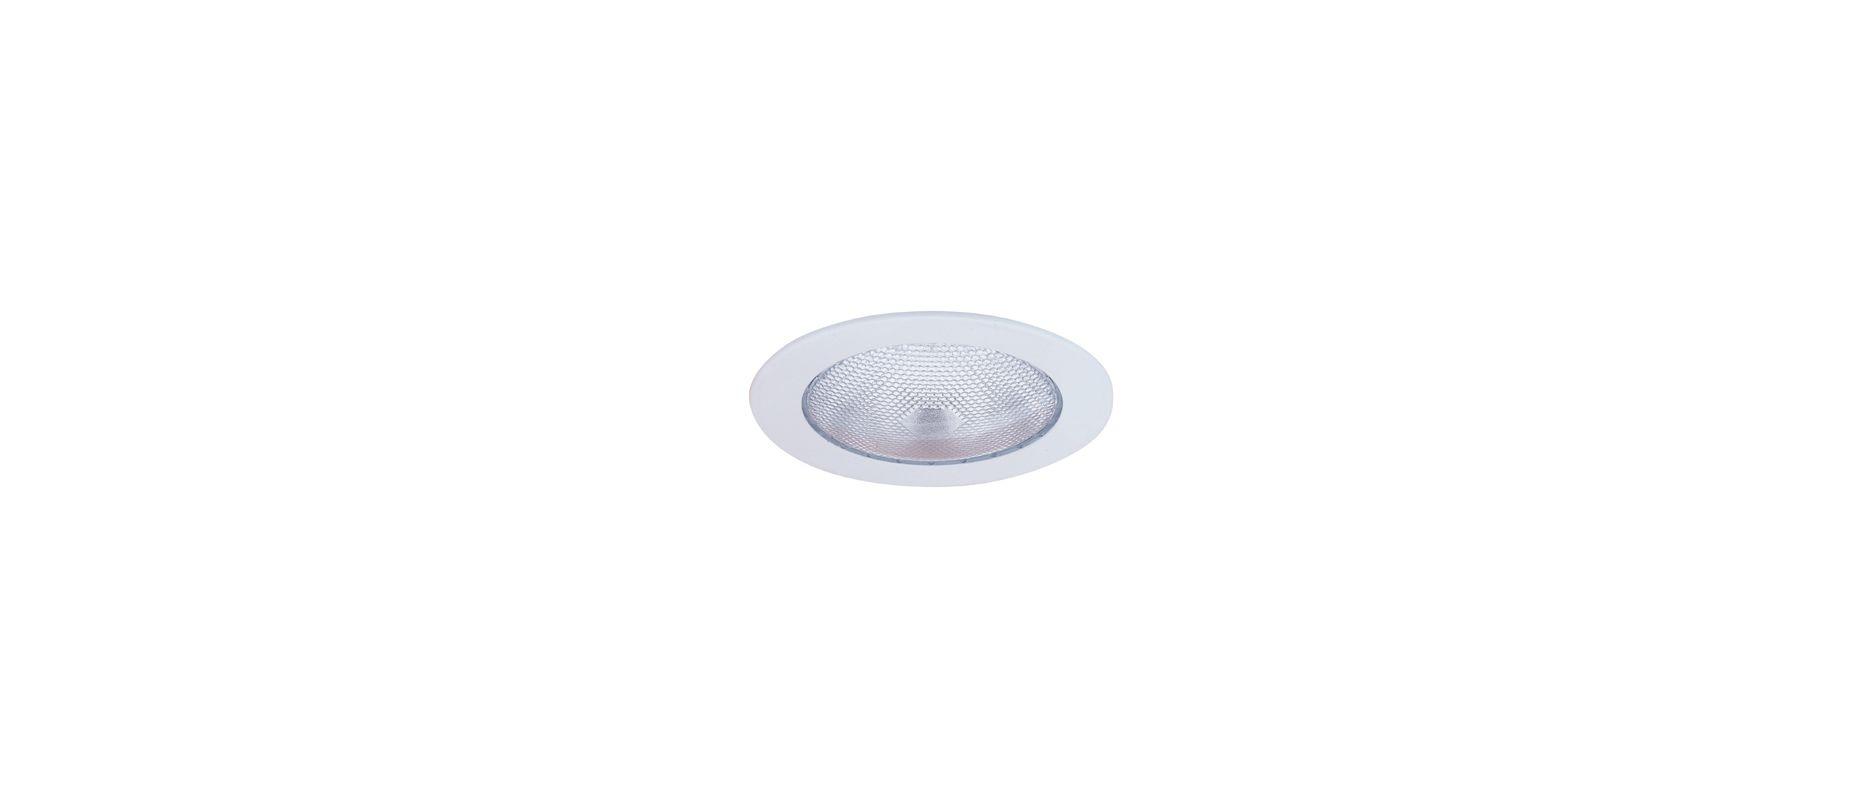 "Elco EL930W 4"" Open Trim White Recessed Lights Shower Trims"